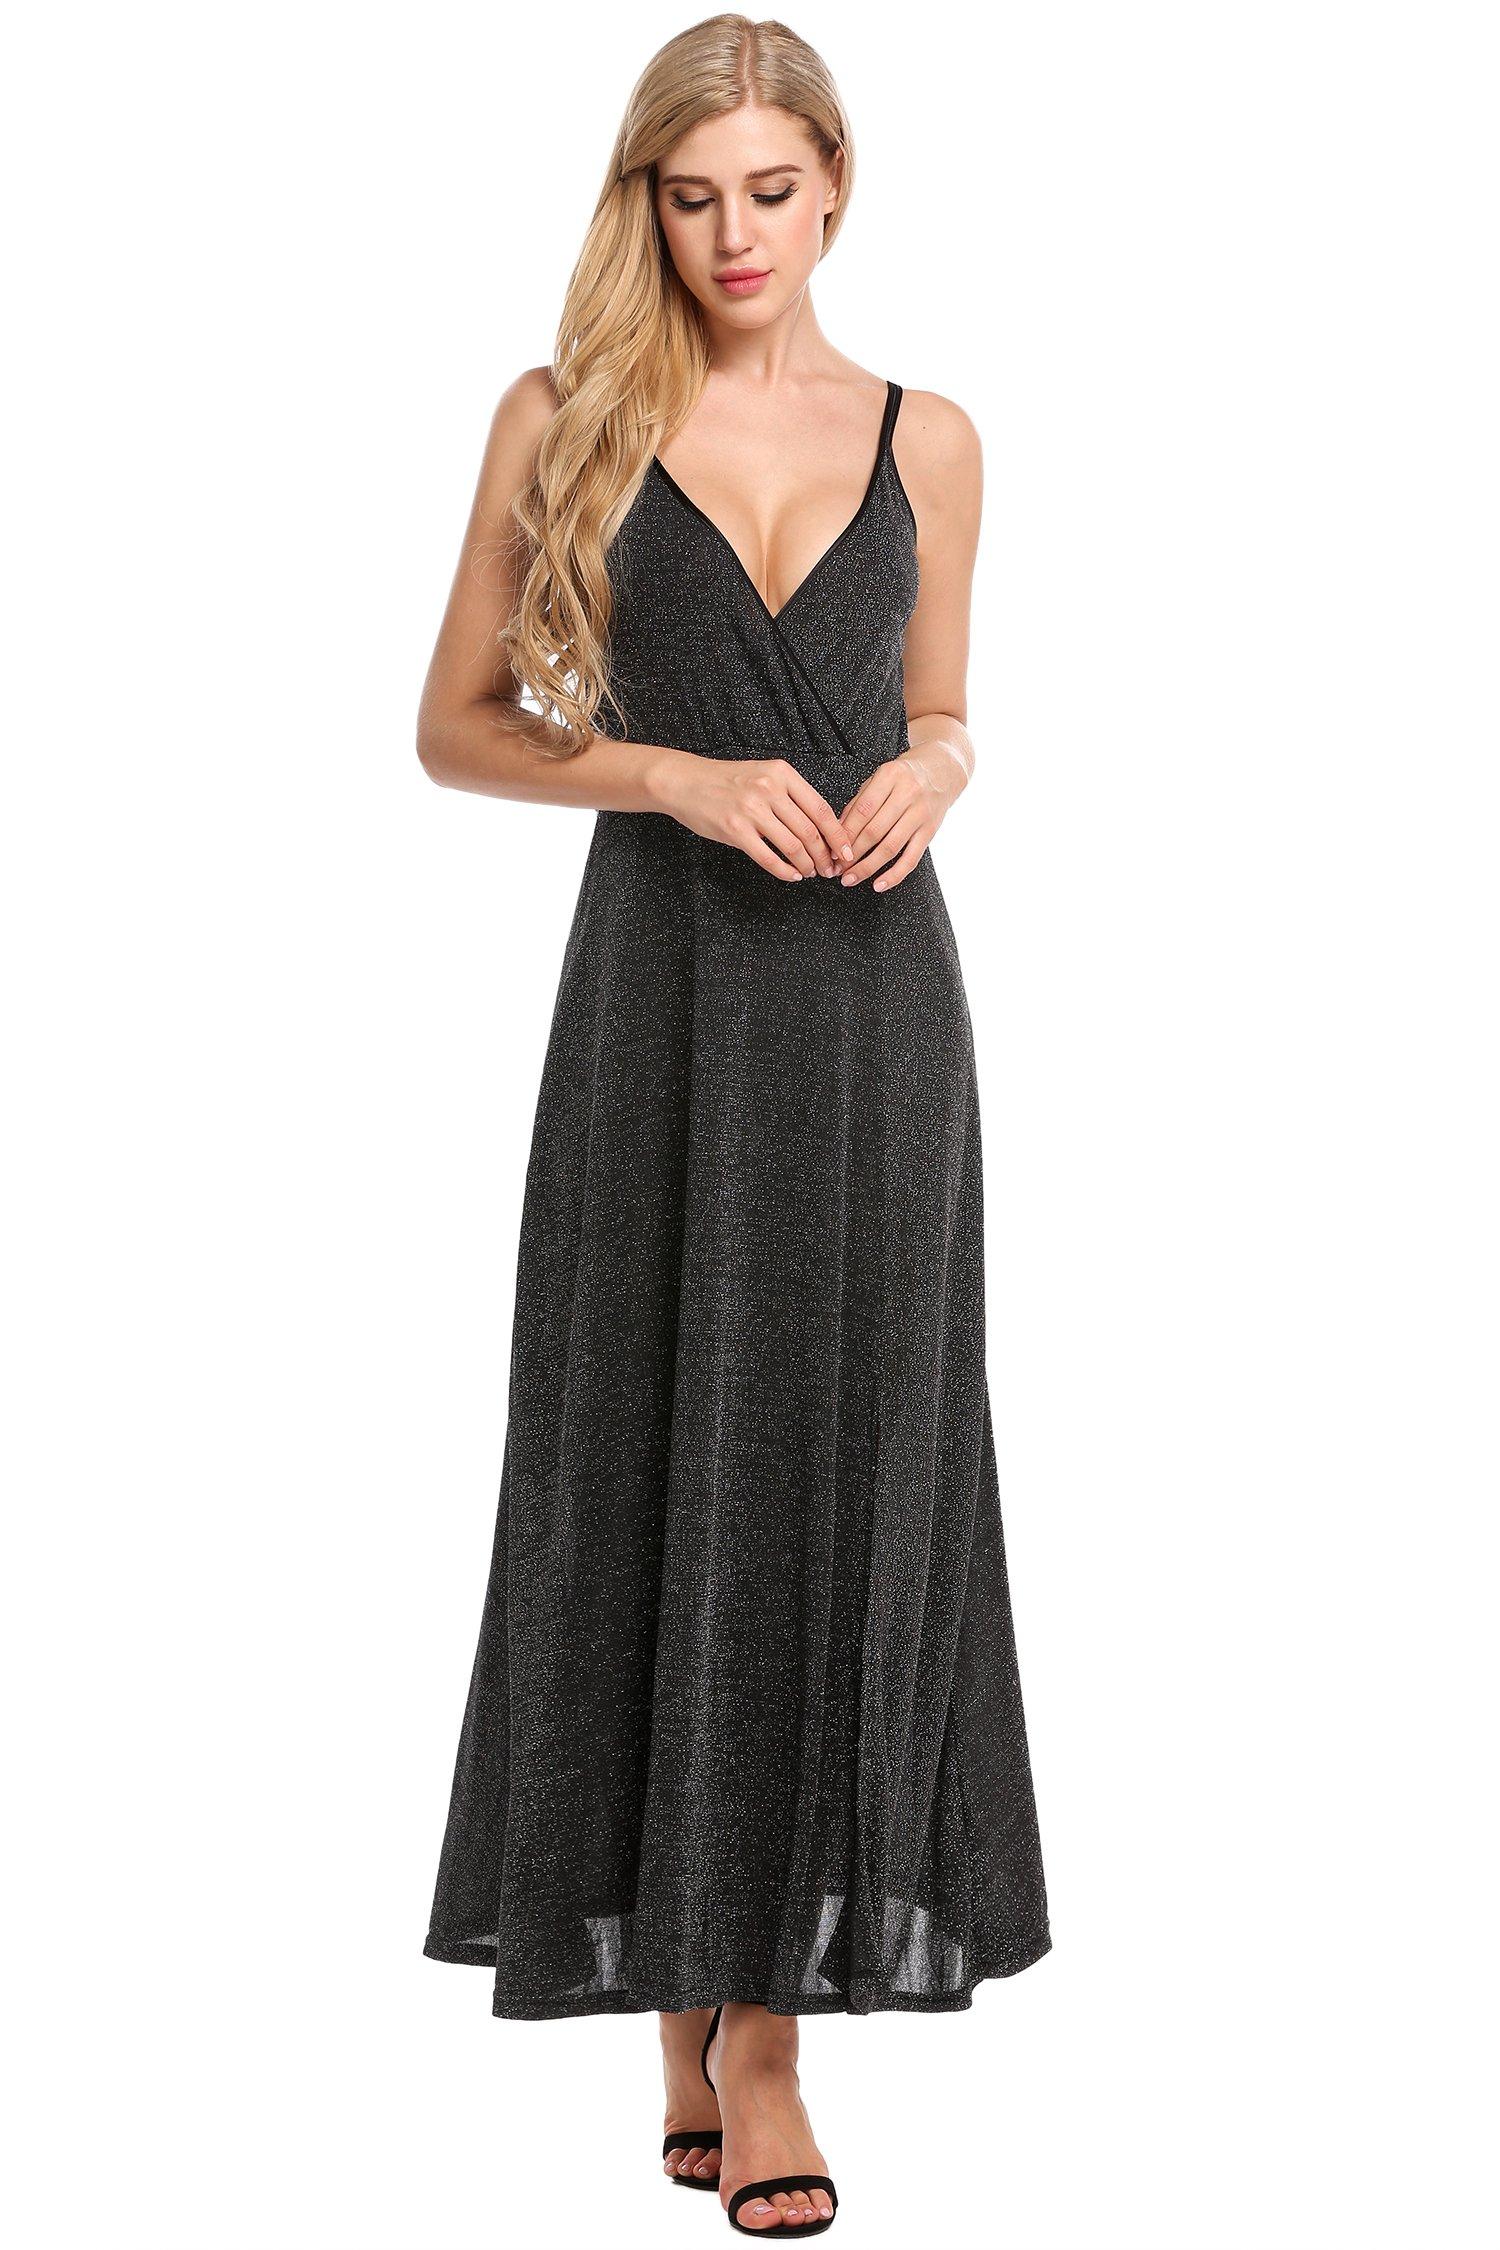 Zeagoo Women's Wrap Sexy V Neck Spaghetti Strap Maxi Evening Dress Black